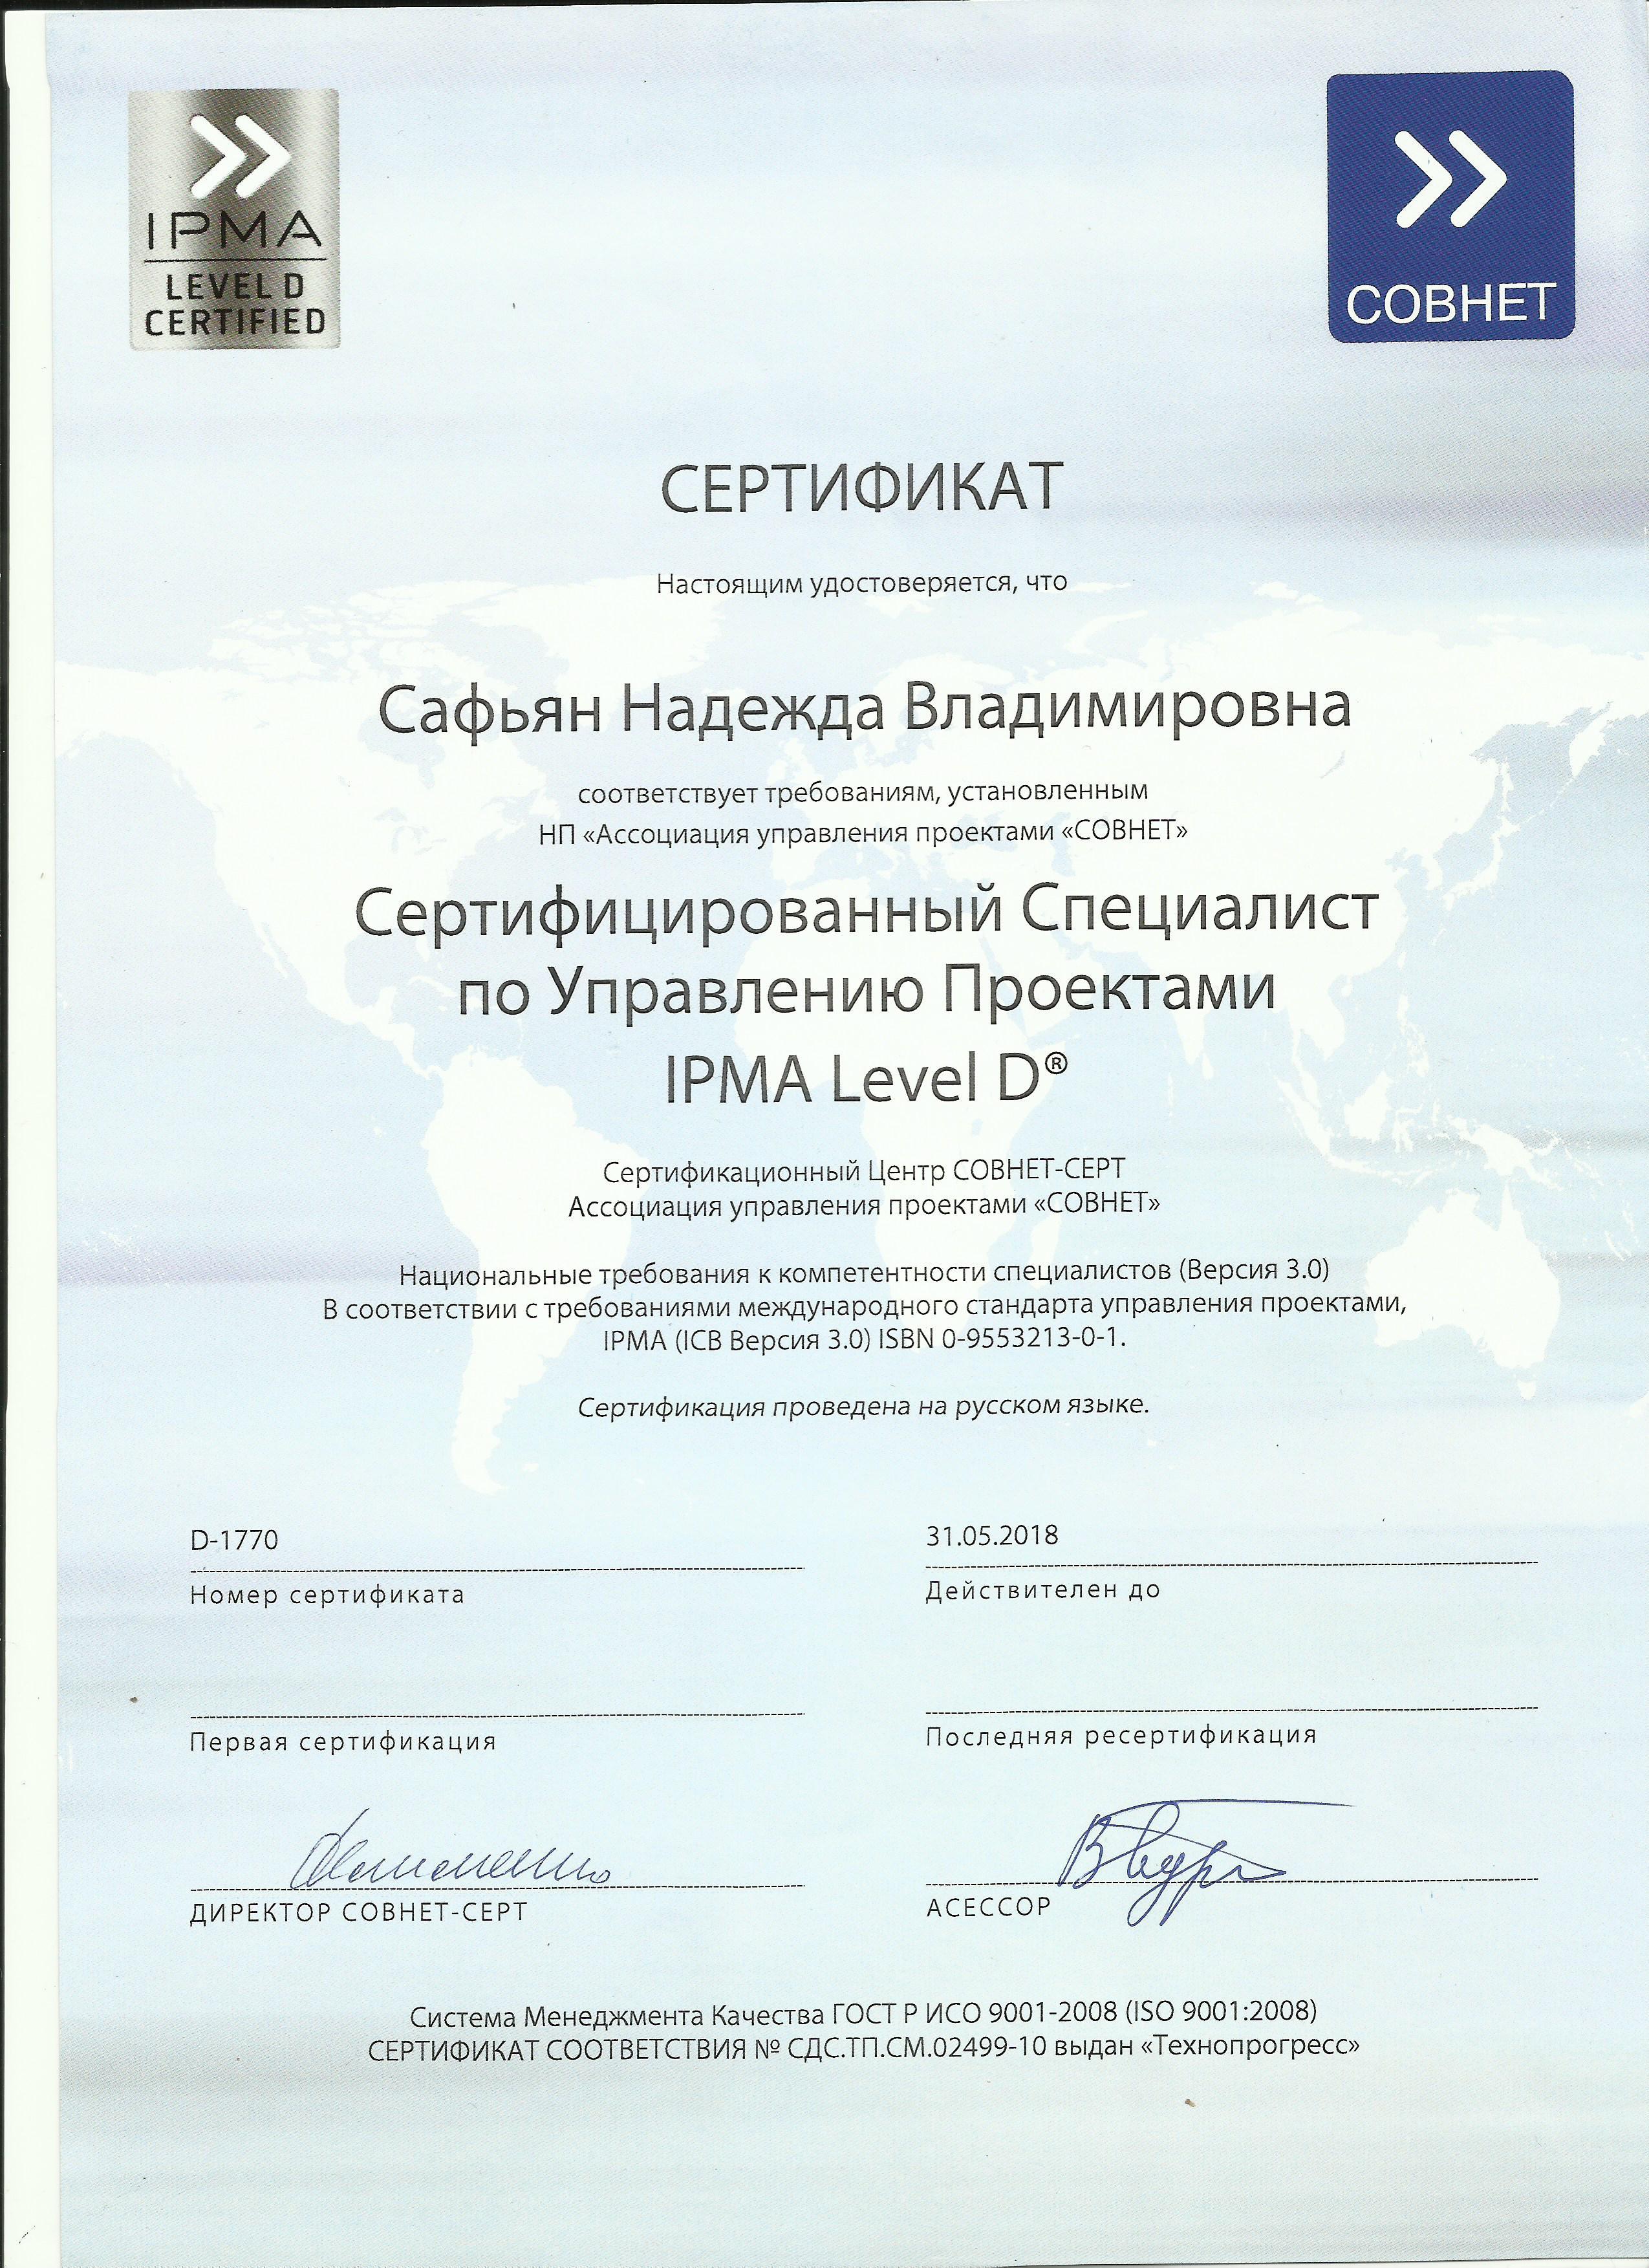 Сертификация ipma москва стандартизация и сертификация в таджикистане